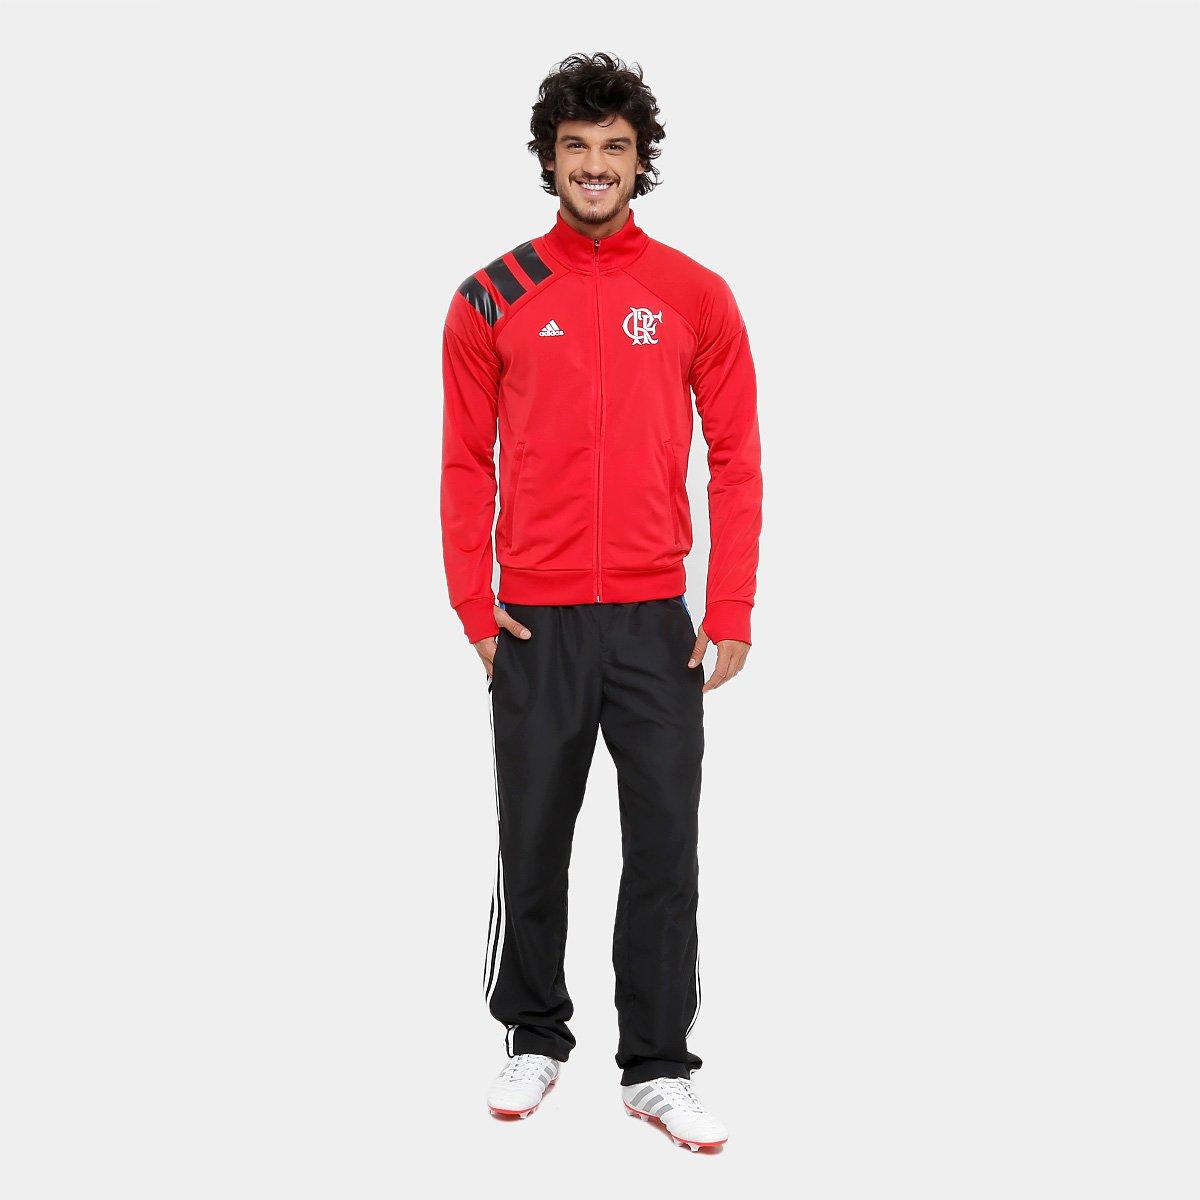 Jaqueta Flamengo Adidas Tango Classic Masculina - Vermelho e Preto ... 36c825682c25d